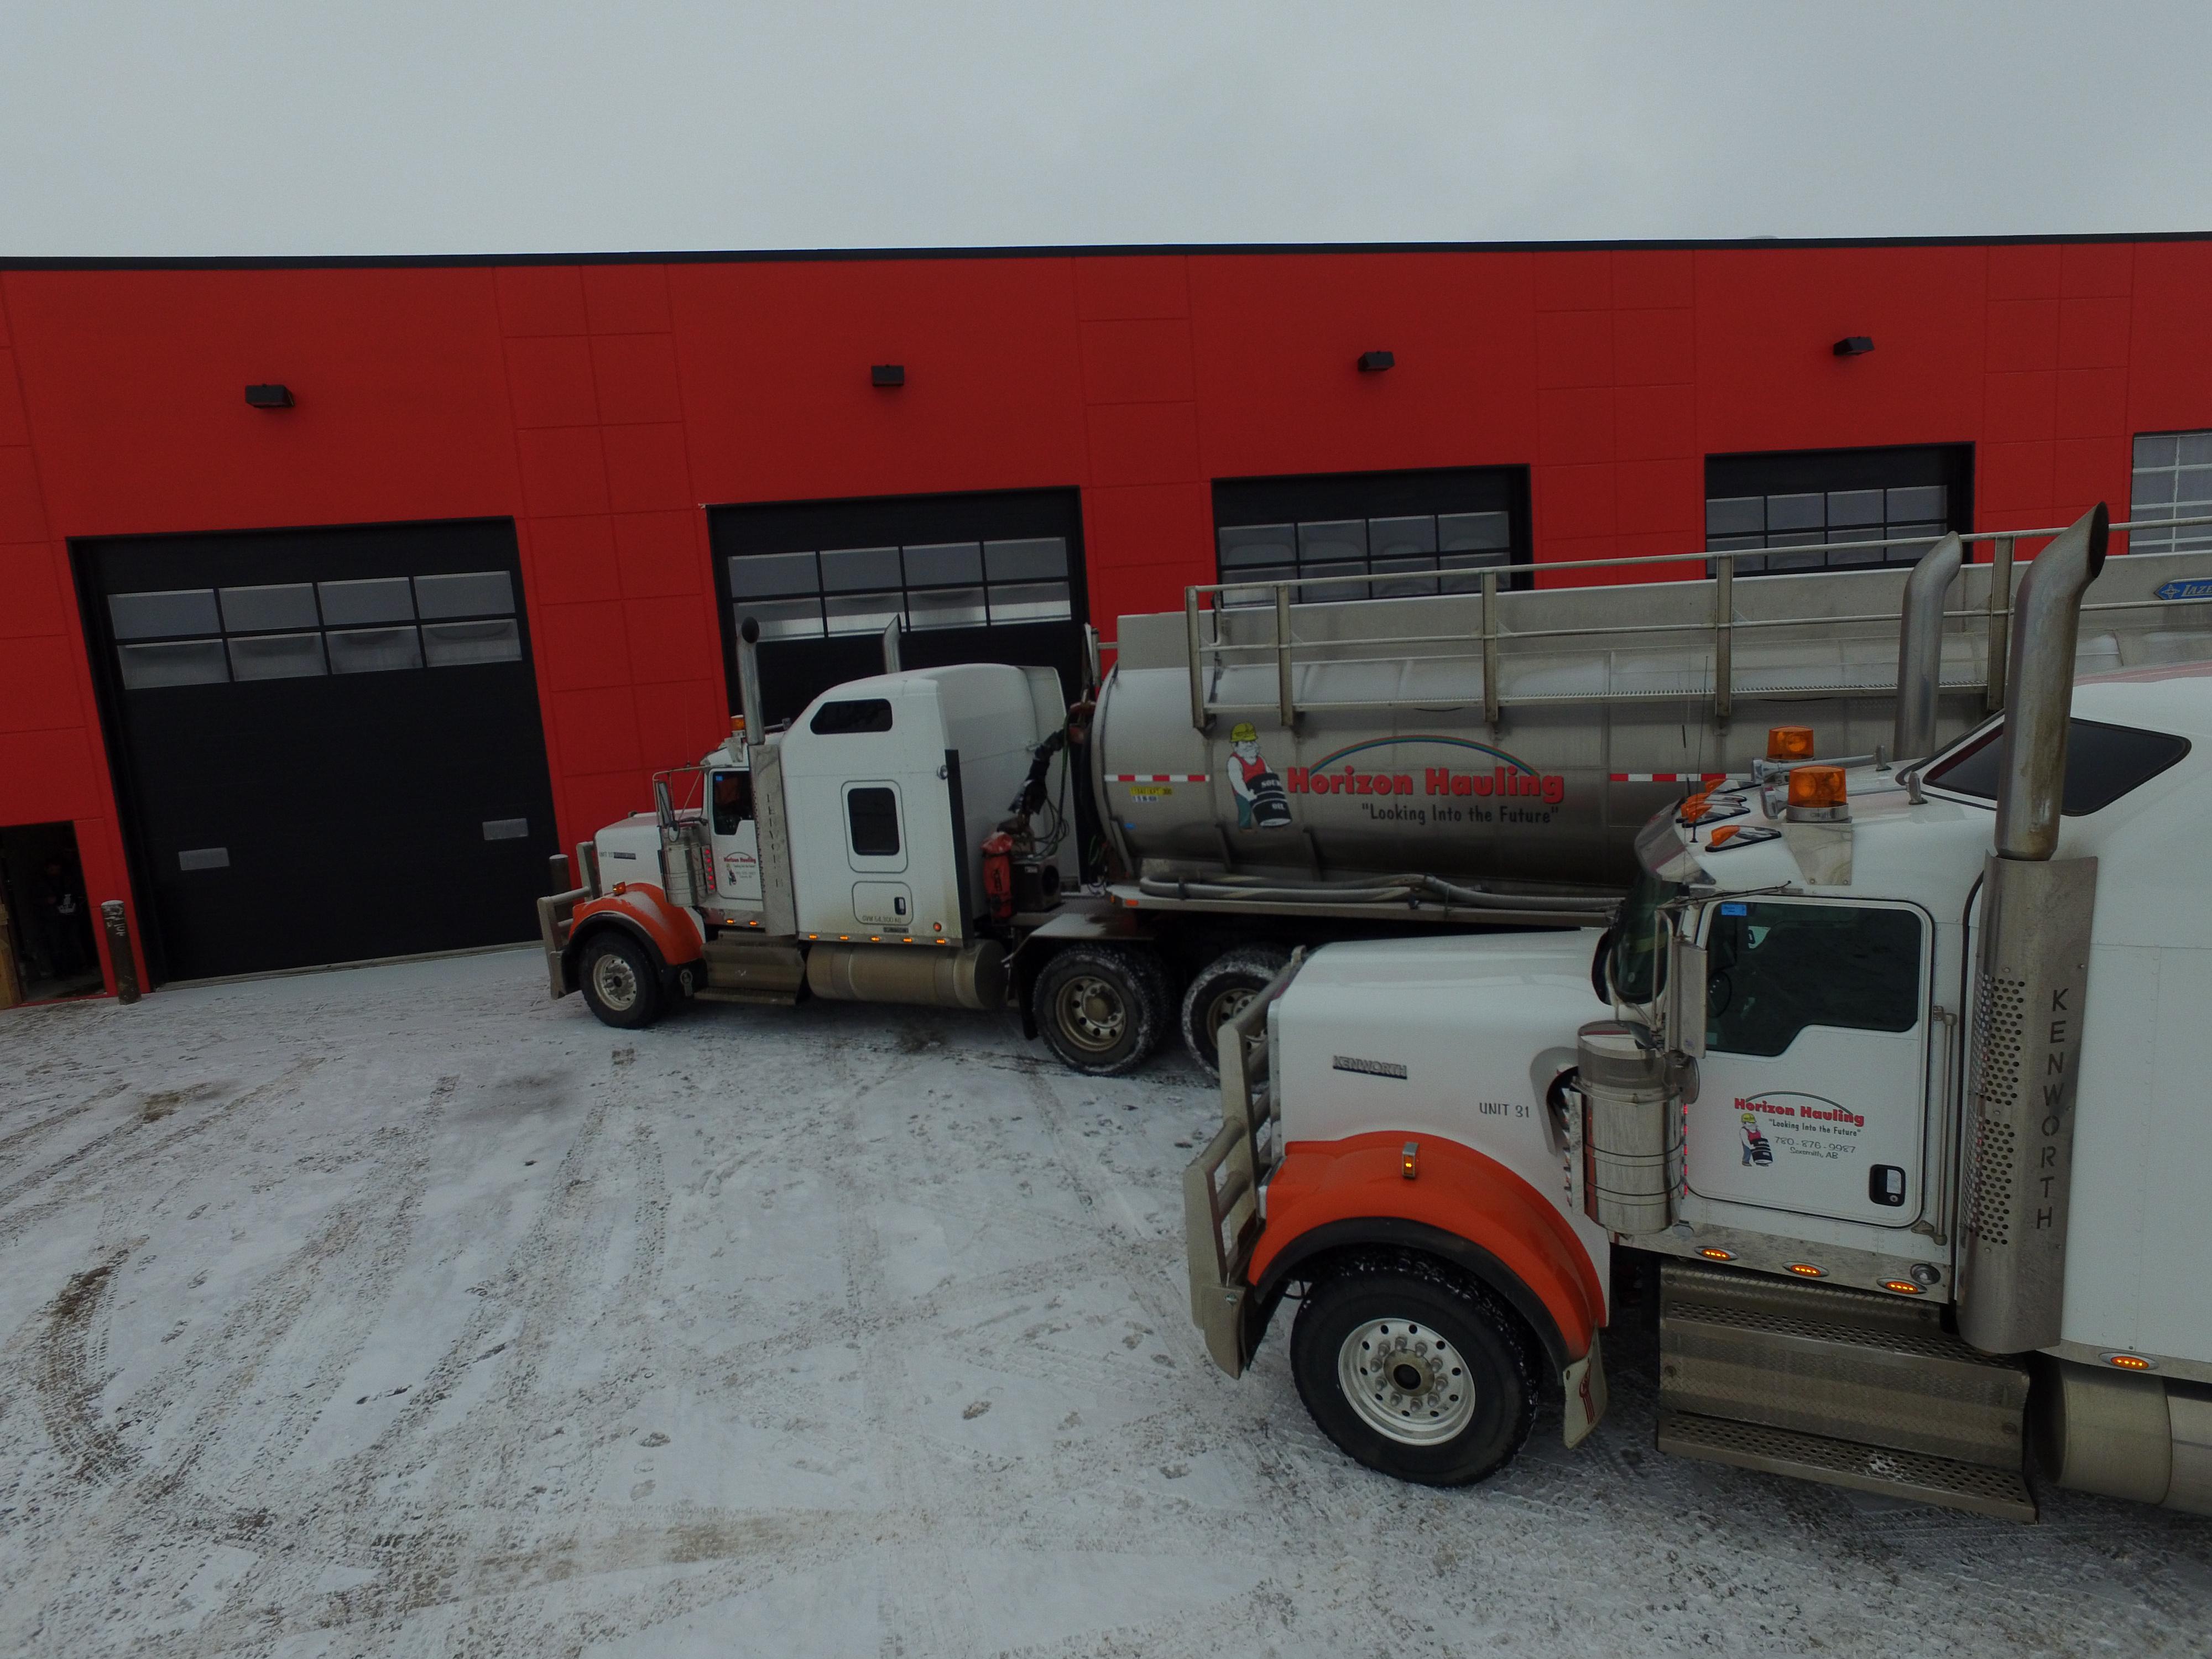 https://0901.nccdn.net/4_2/000/000/038/2d3/Trucks-on-side-of-shop-4000x3000.jpg